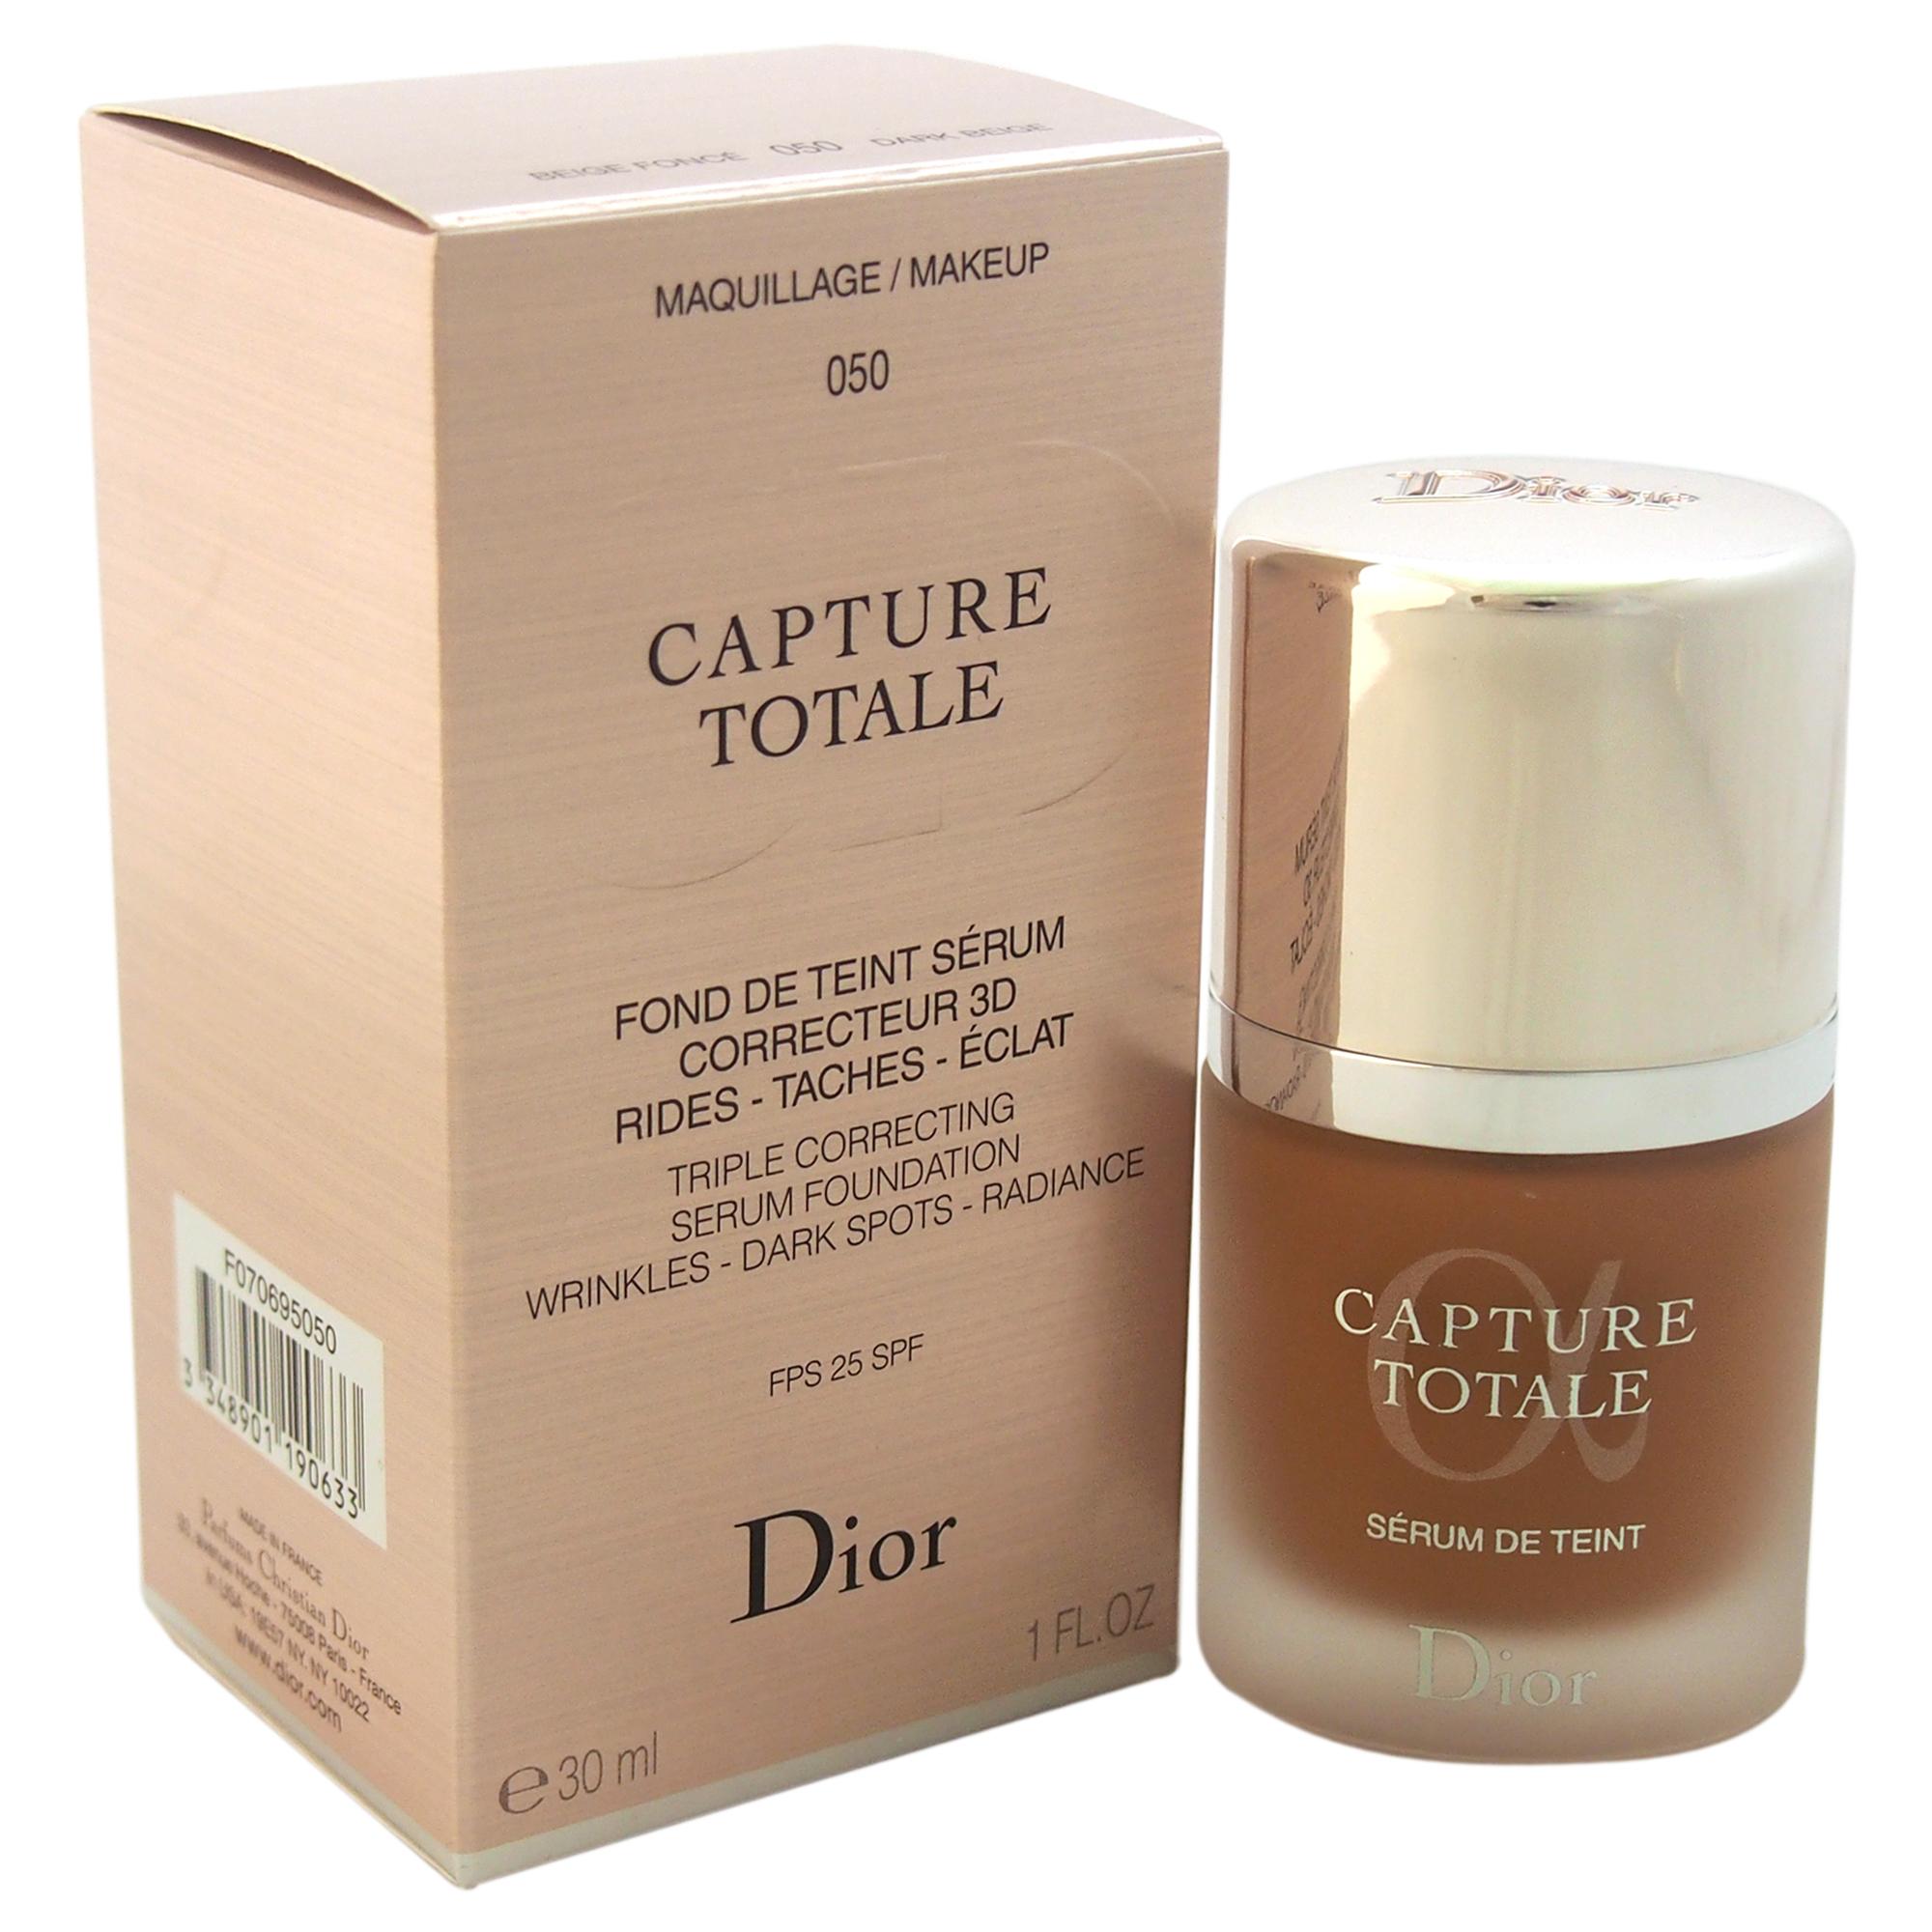 CaptureTotale Triple Correcting Serum Found.#50-Christian Dior 1oz